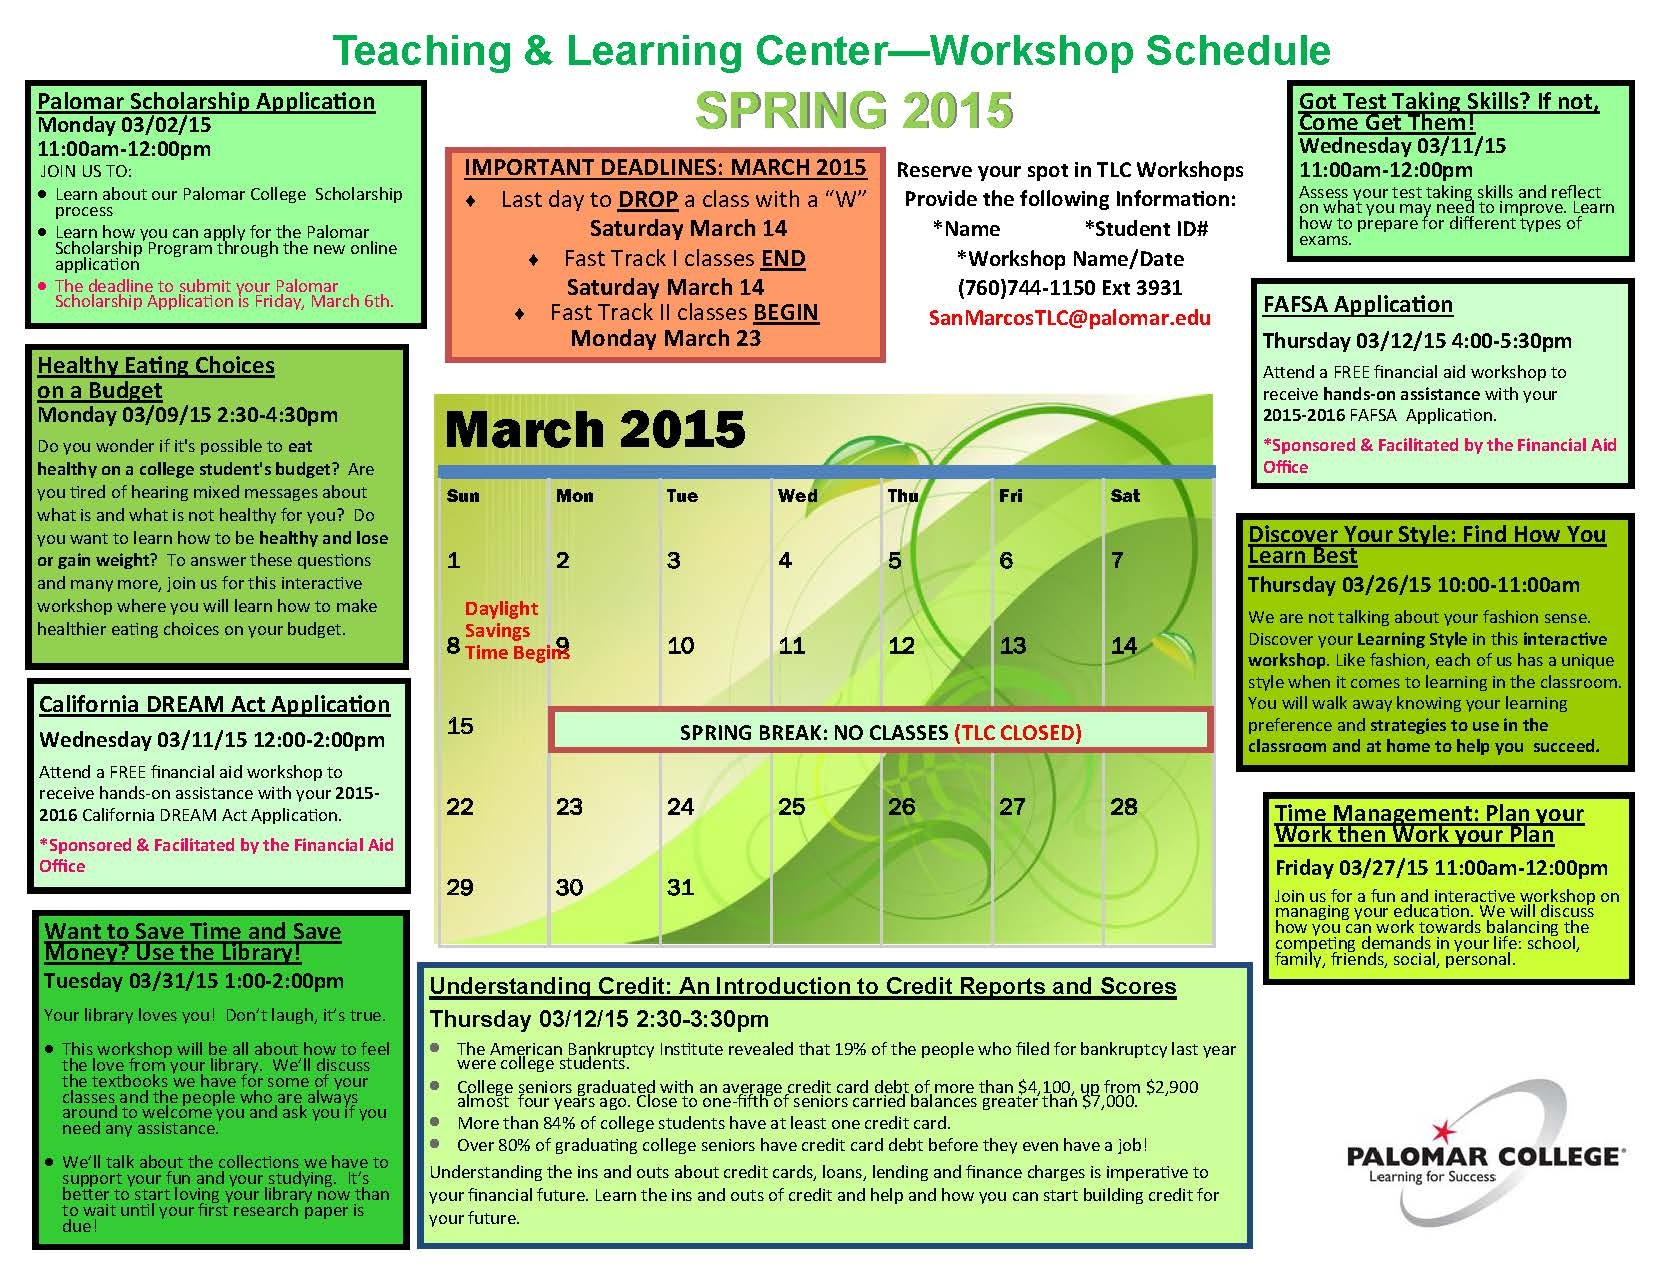 SP2015_TLC Workshop Schedule_March